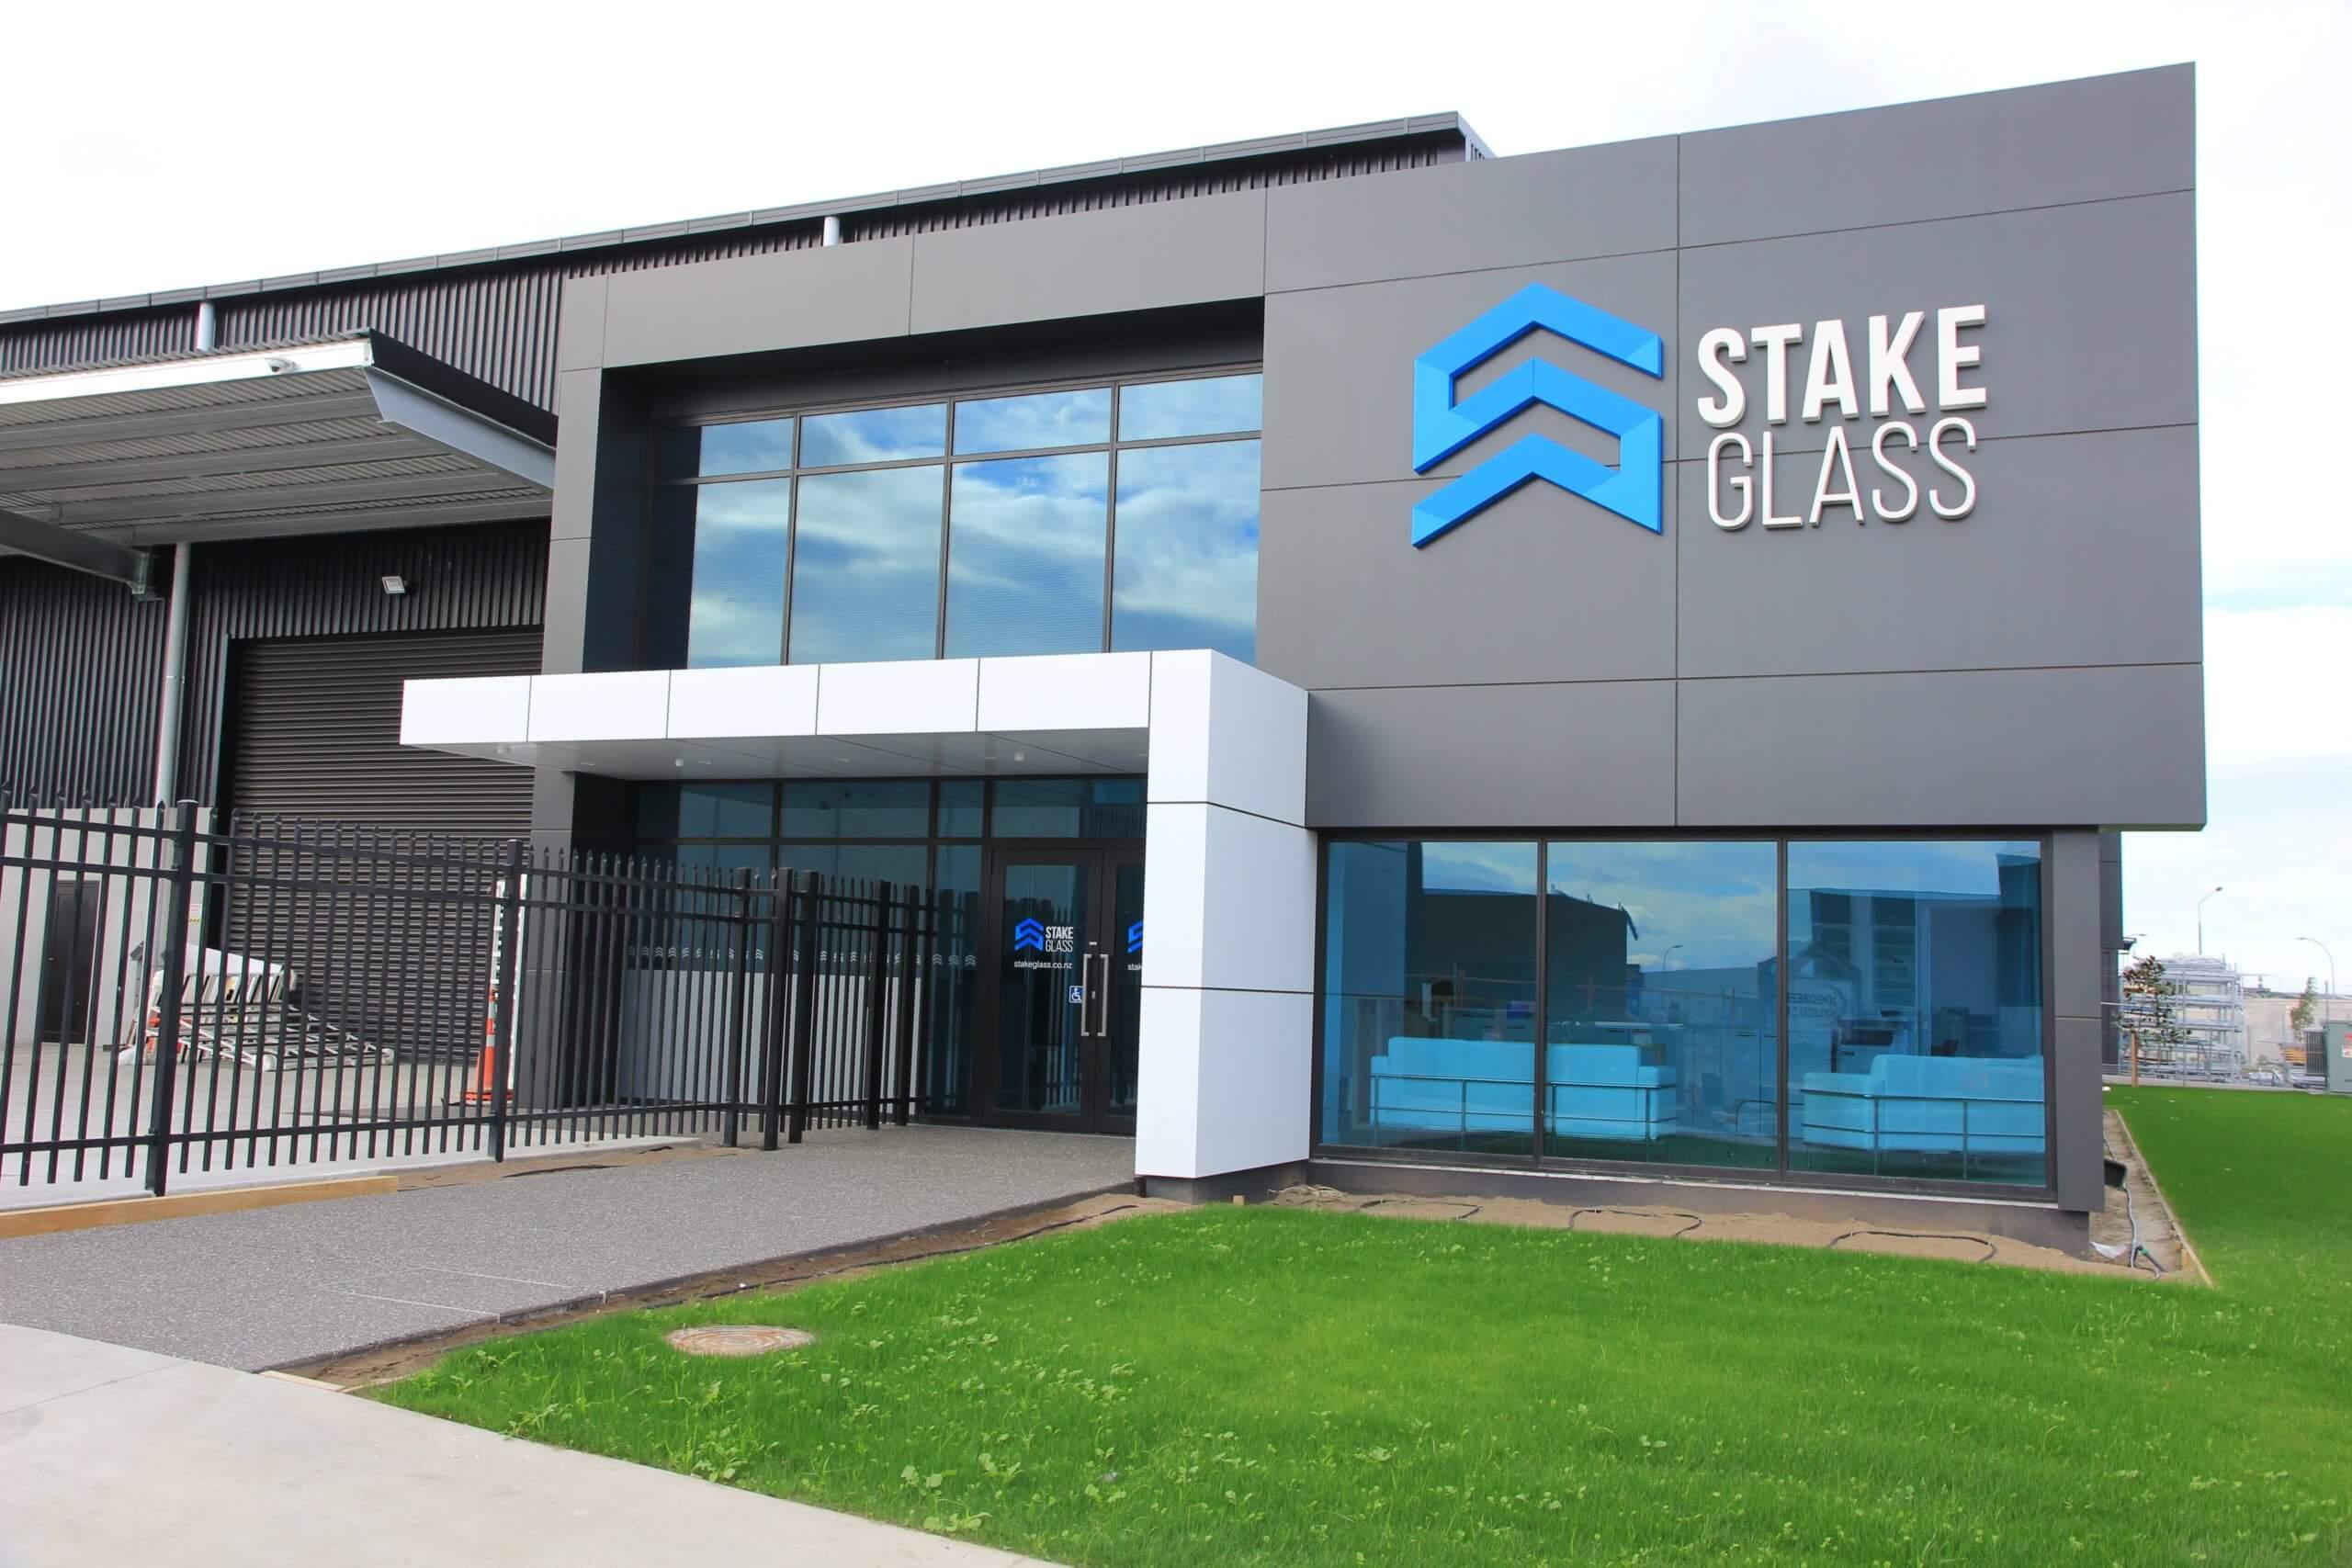 Stake Glass